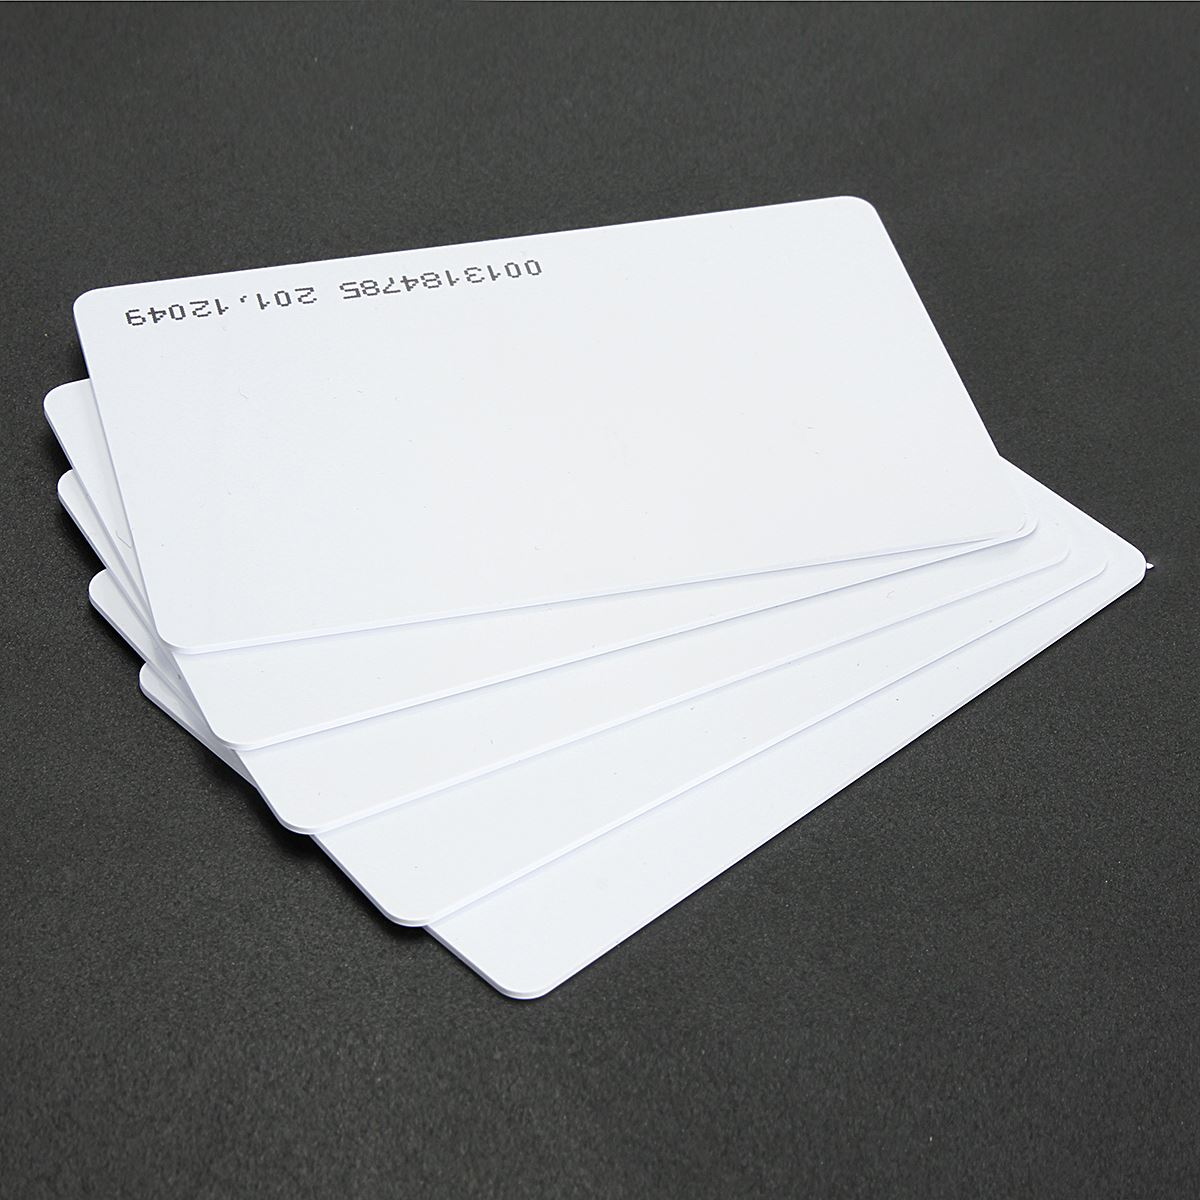 5Pcs RFID 125khz Card Proximity ID Access control EM4100 EM4200 5 125